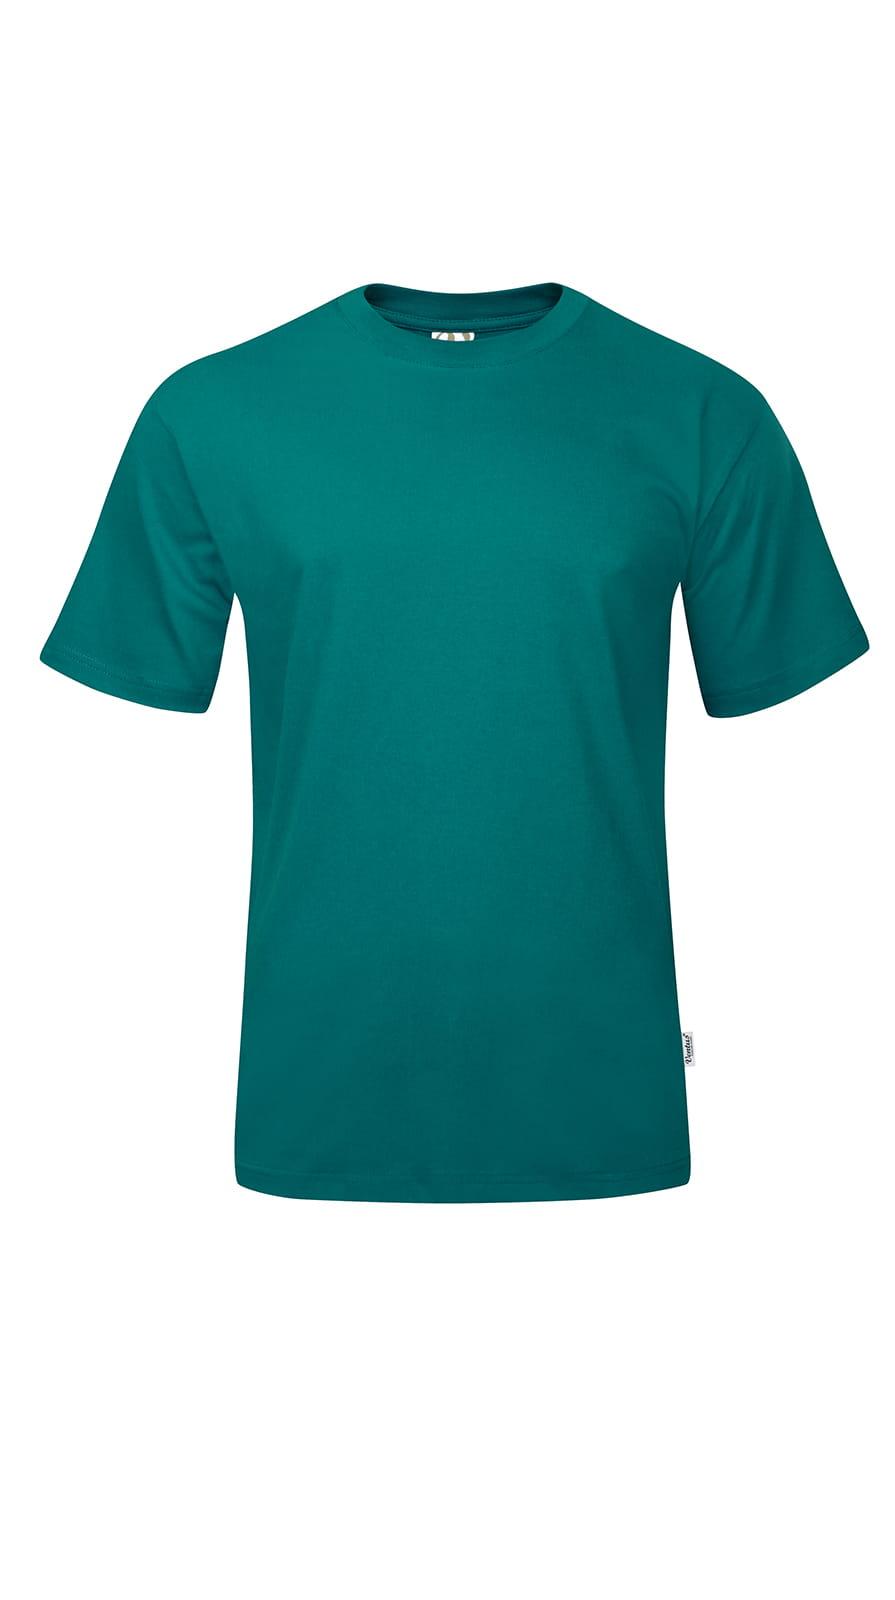 8b7687887 Koszulka T-shirt męska VKT-1 zielony 6004 Ventus Collection